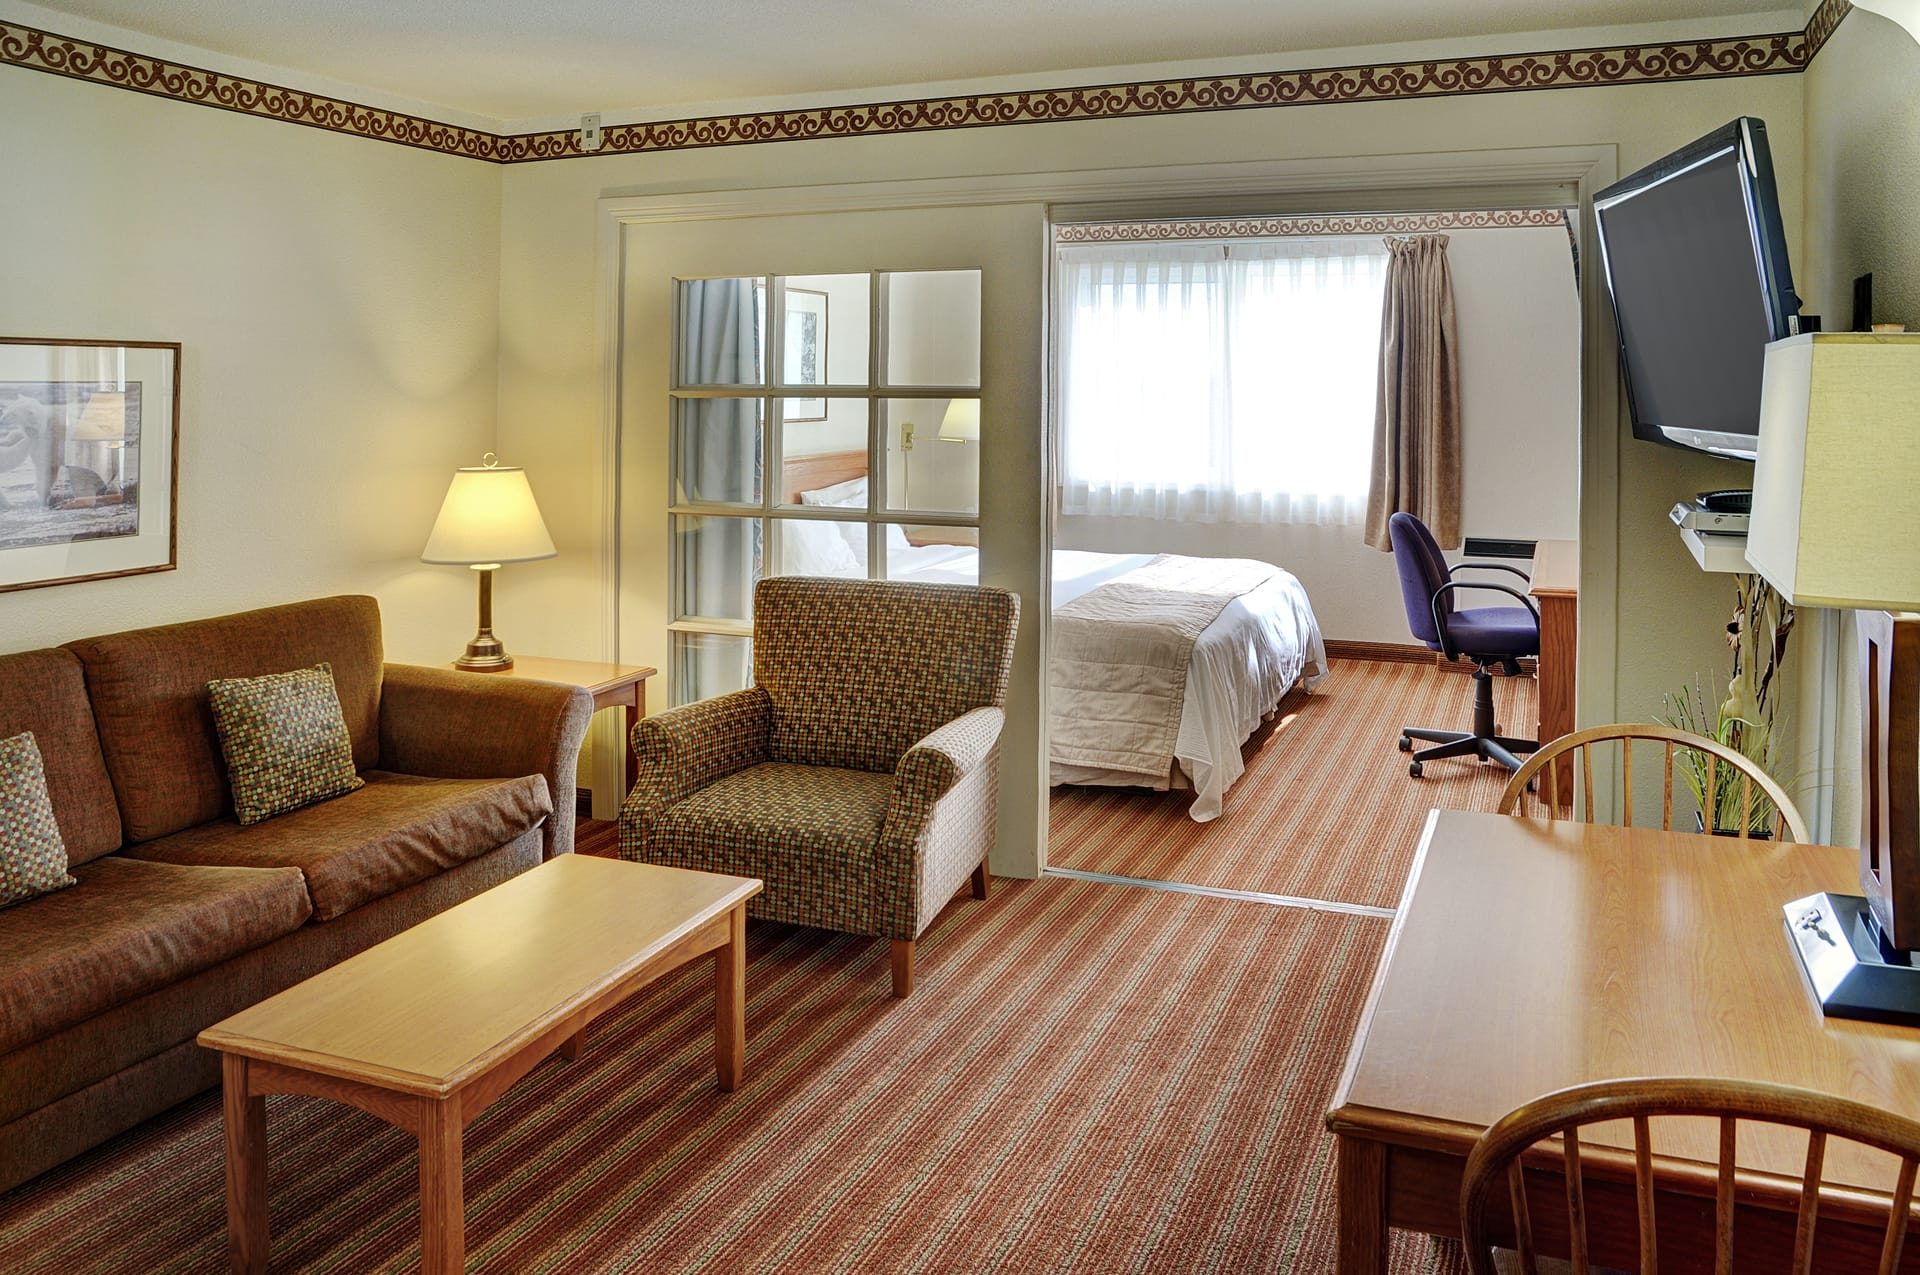 Lakeview Inns & suites - Brandon - Hotel Suite